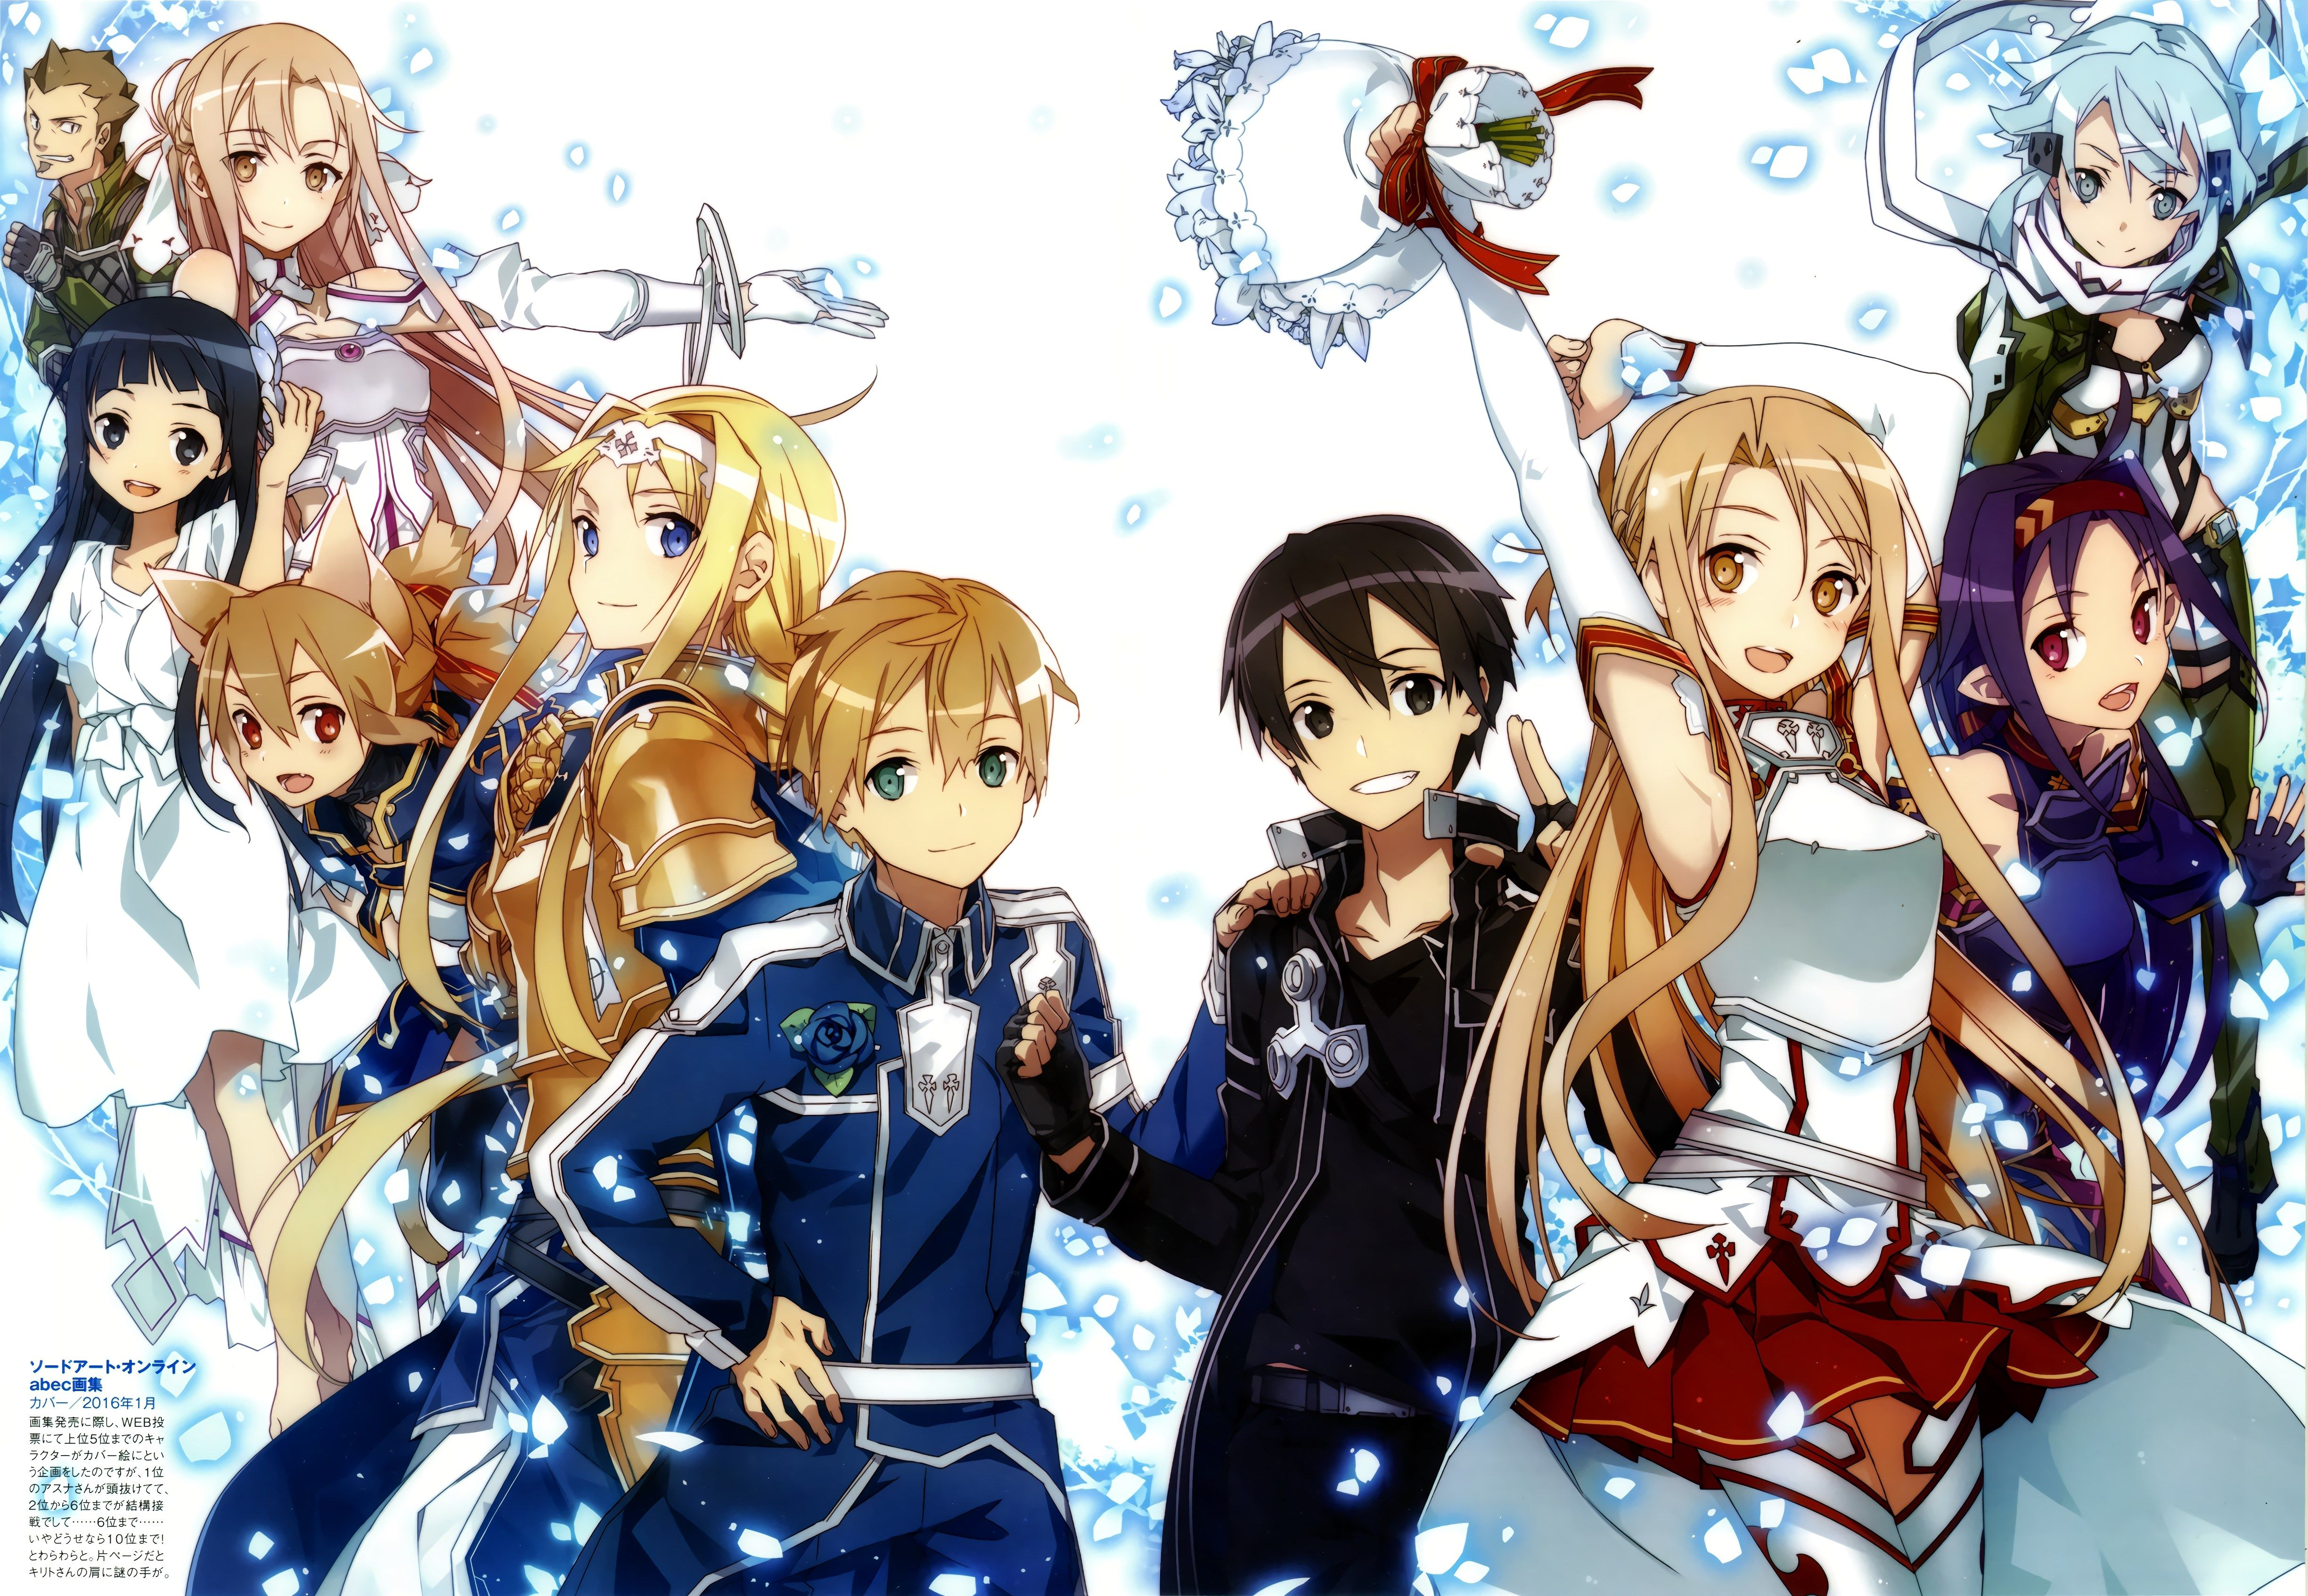 Sword Art Online Alicization Wallpaper 4k Anime Top Wallpaper